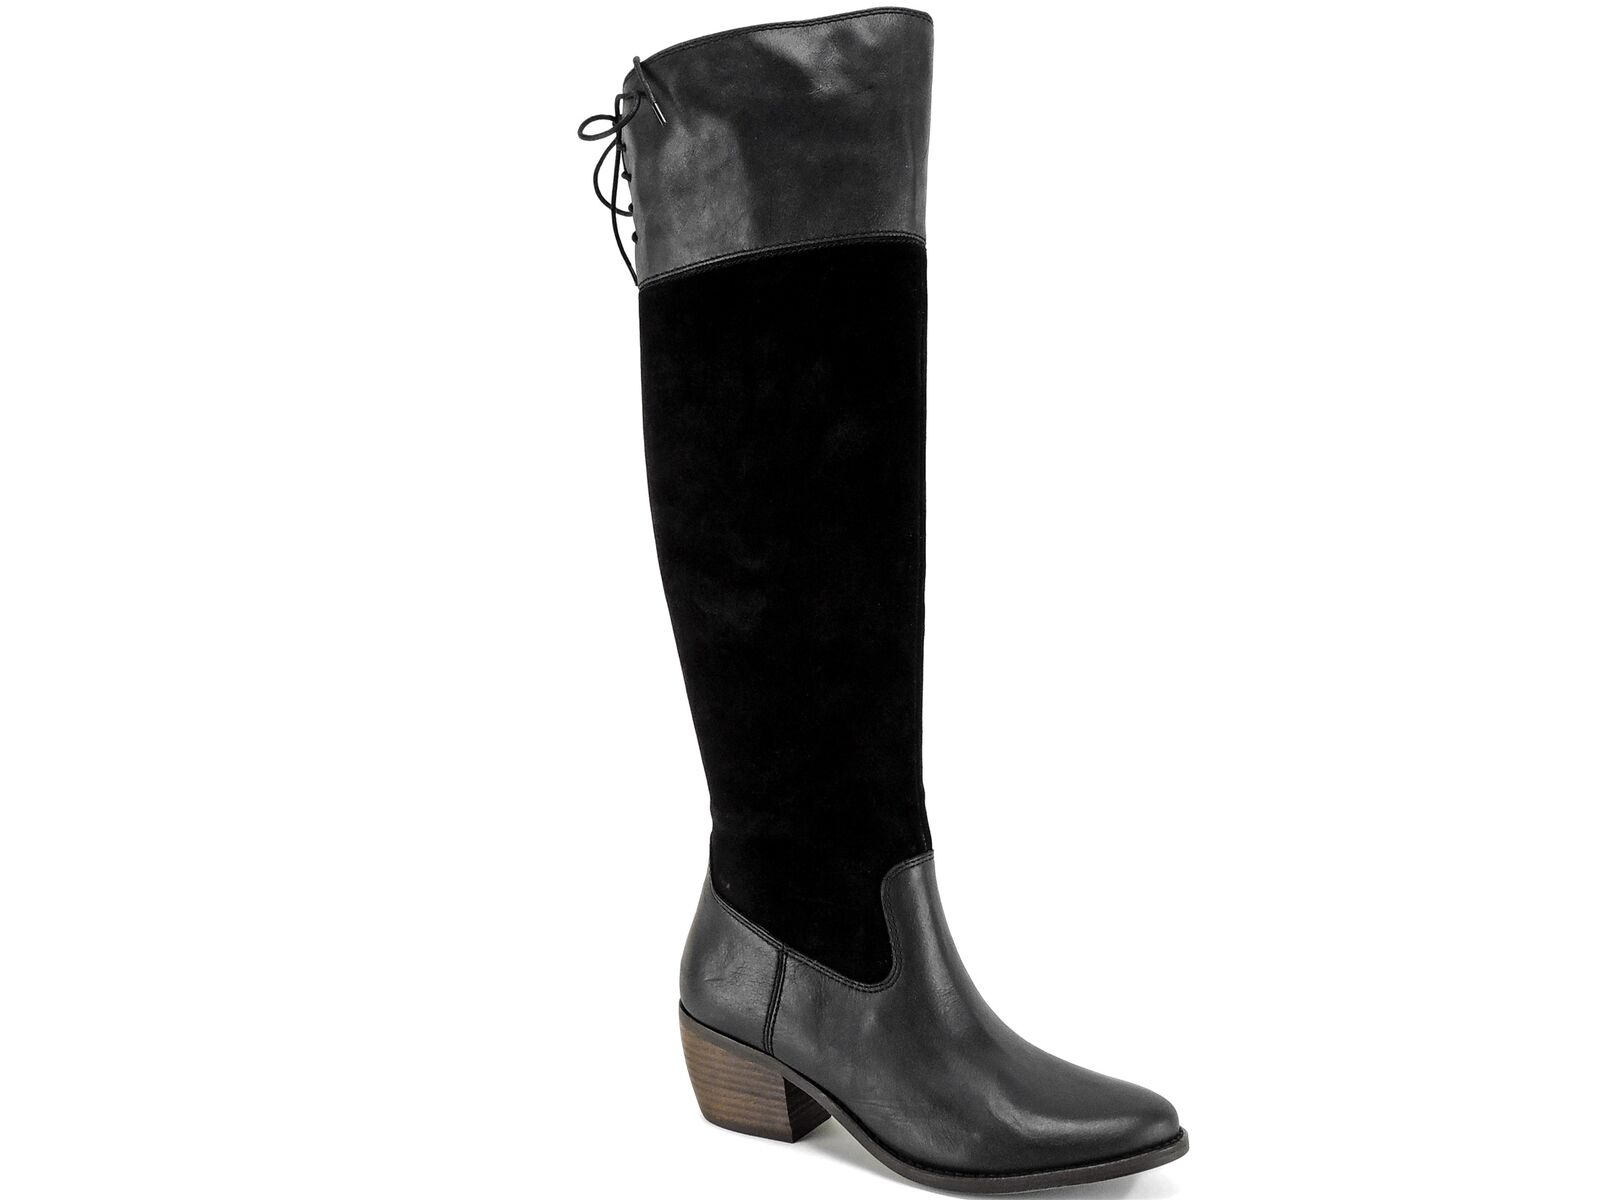 Lucky Brand Women's Komah Boots Black Tuscadero Leather Size 8.5 M